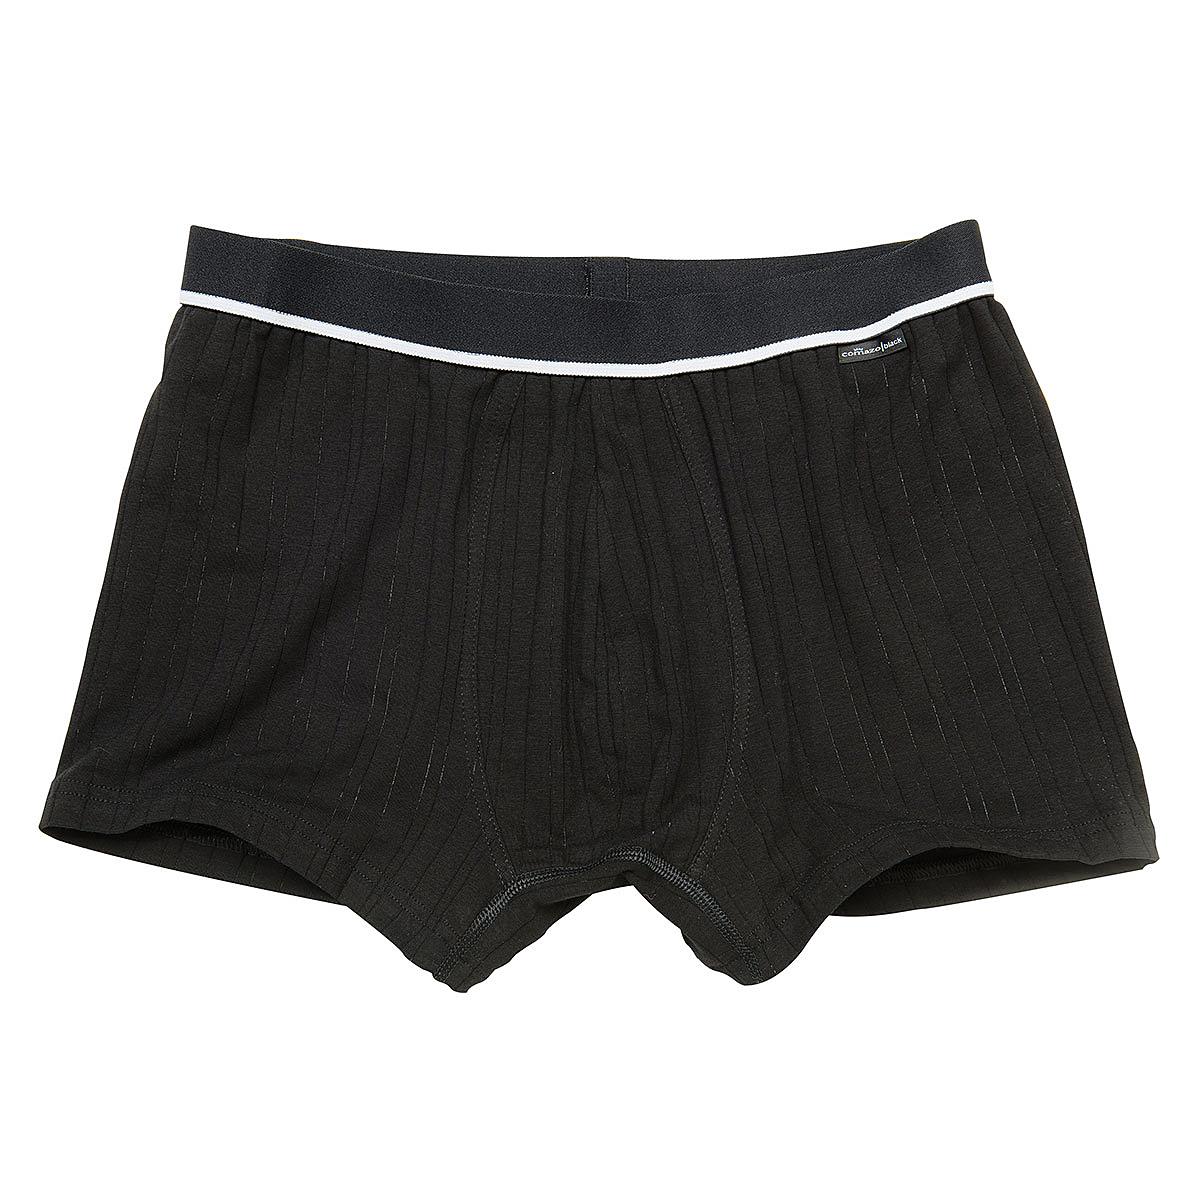 Comazo | Trunks, Herren-Unterhose | Elastische Baumwolle ...